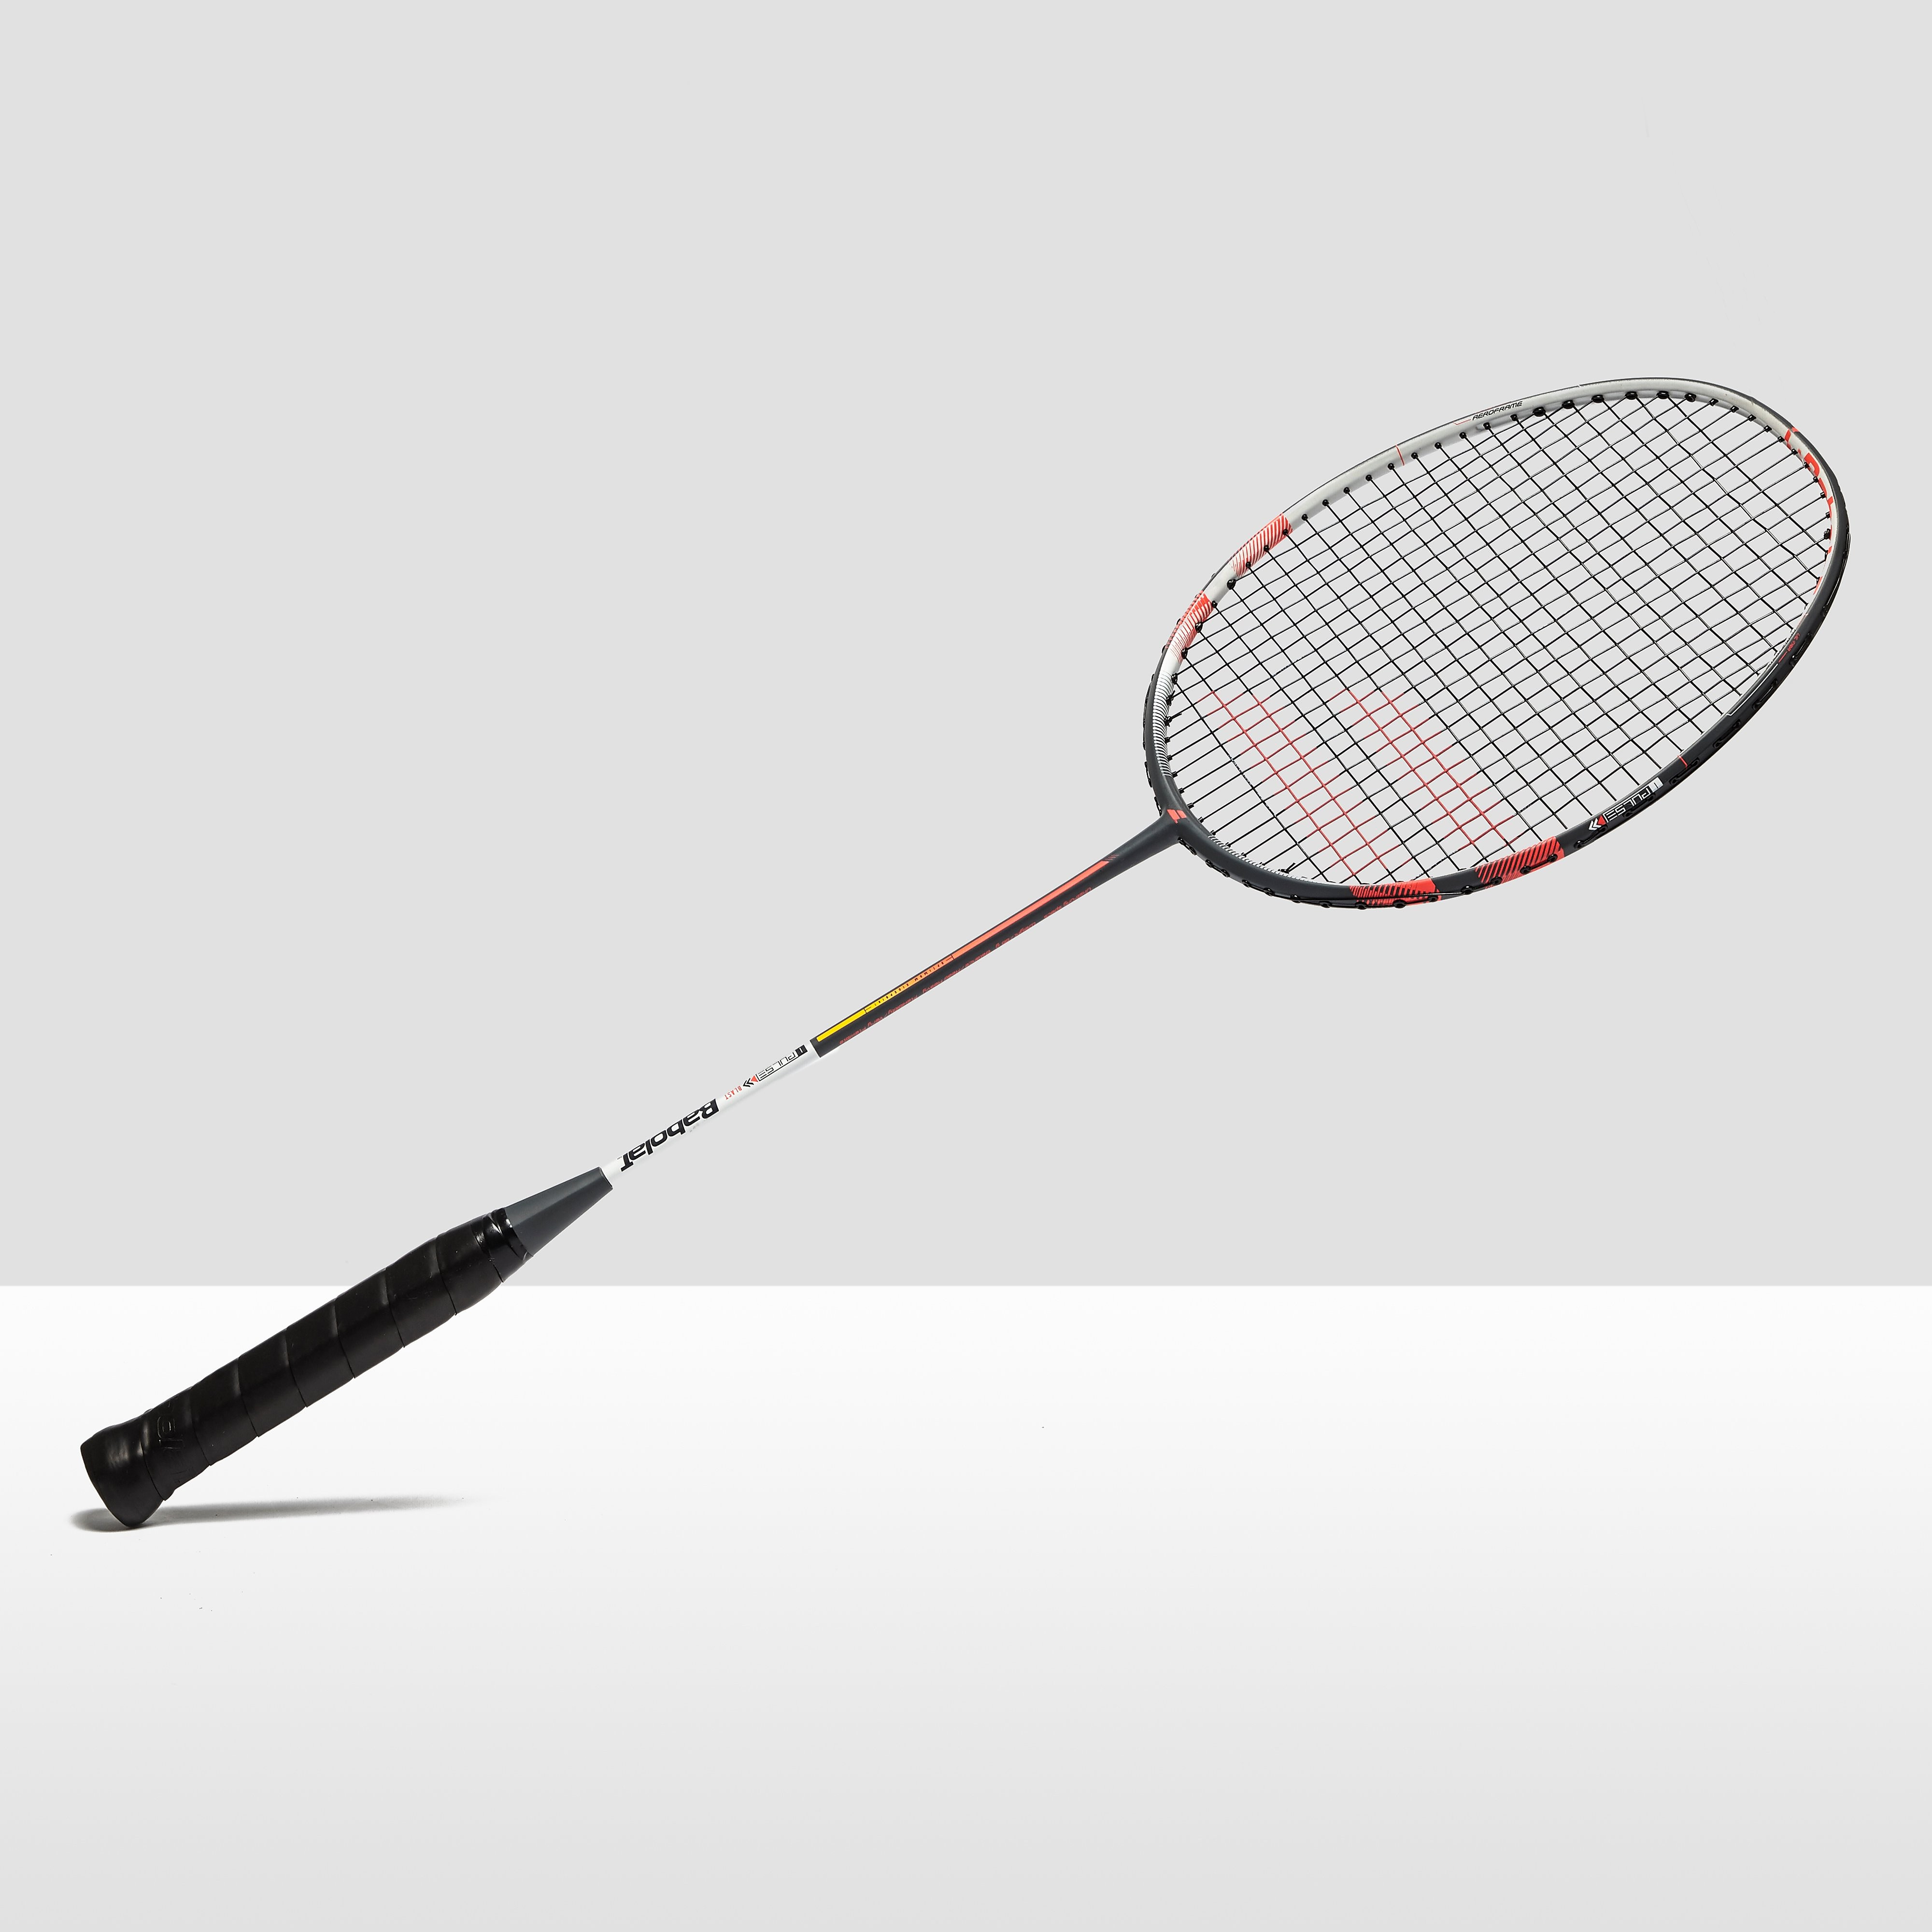 Babolat I-Pulse Black Badminton Racket